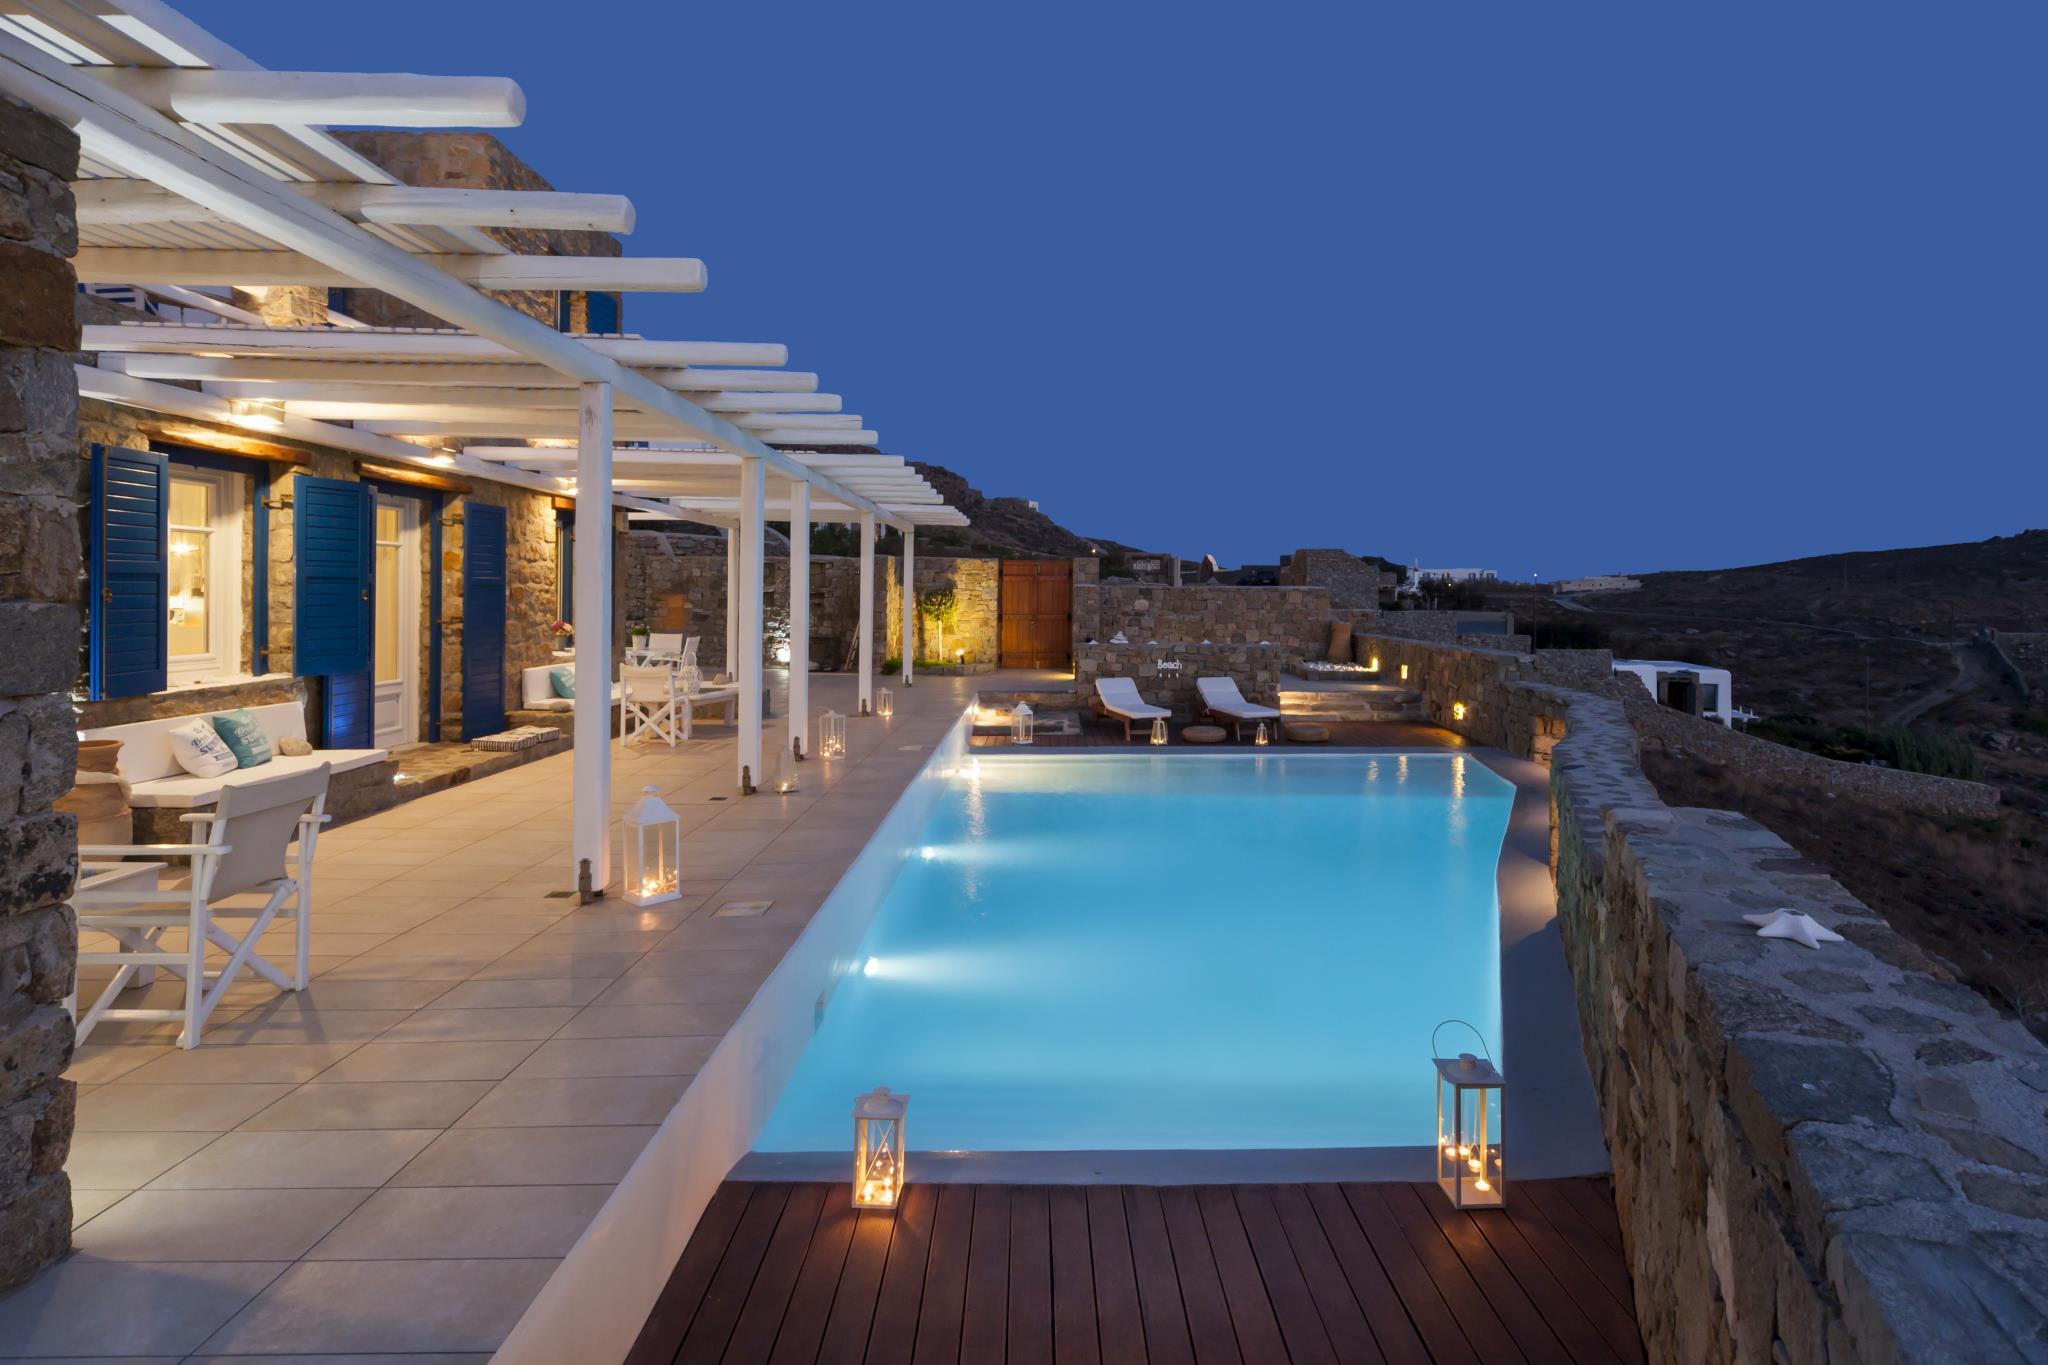 180 View PRIVATE Pool Villa Choulakia To Enjoy The SUN Kissing The SEA